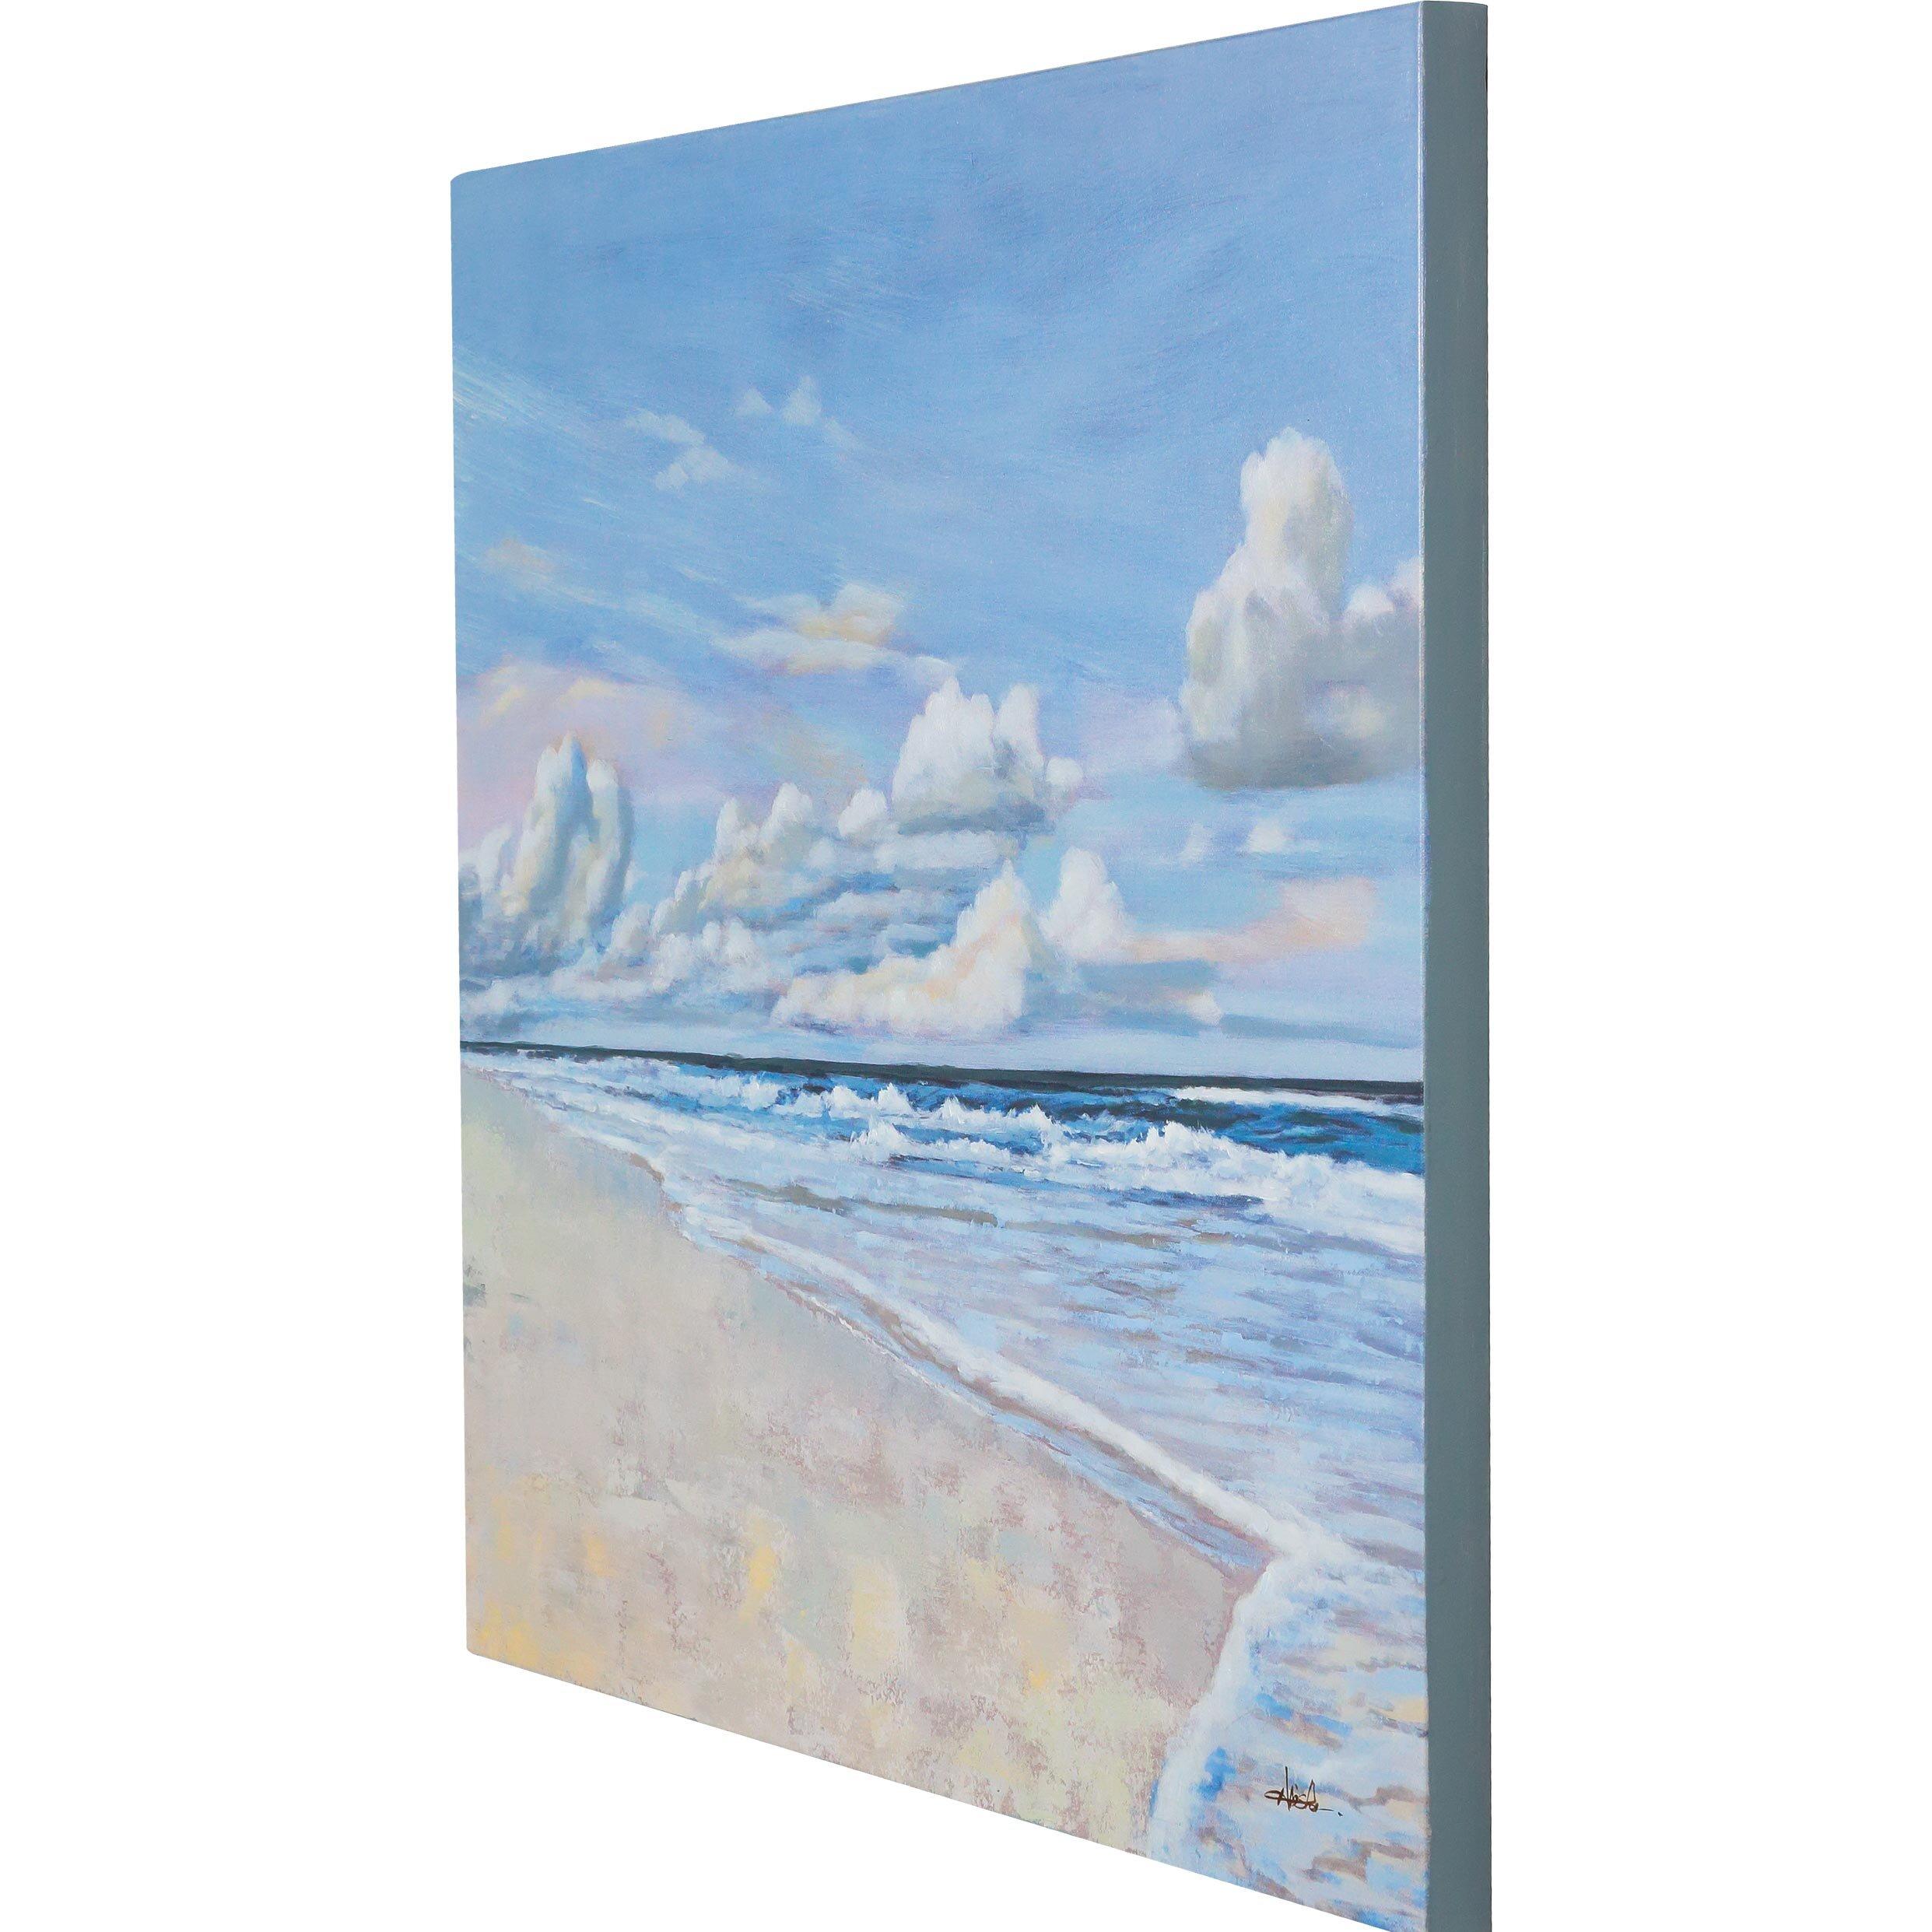 y decor calming original painting on canvas amp reviews calming modern interiors futura home decorating